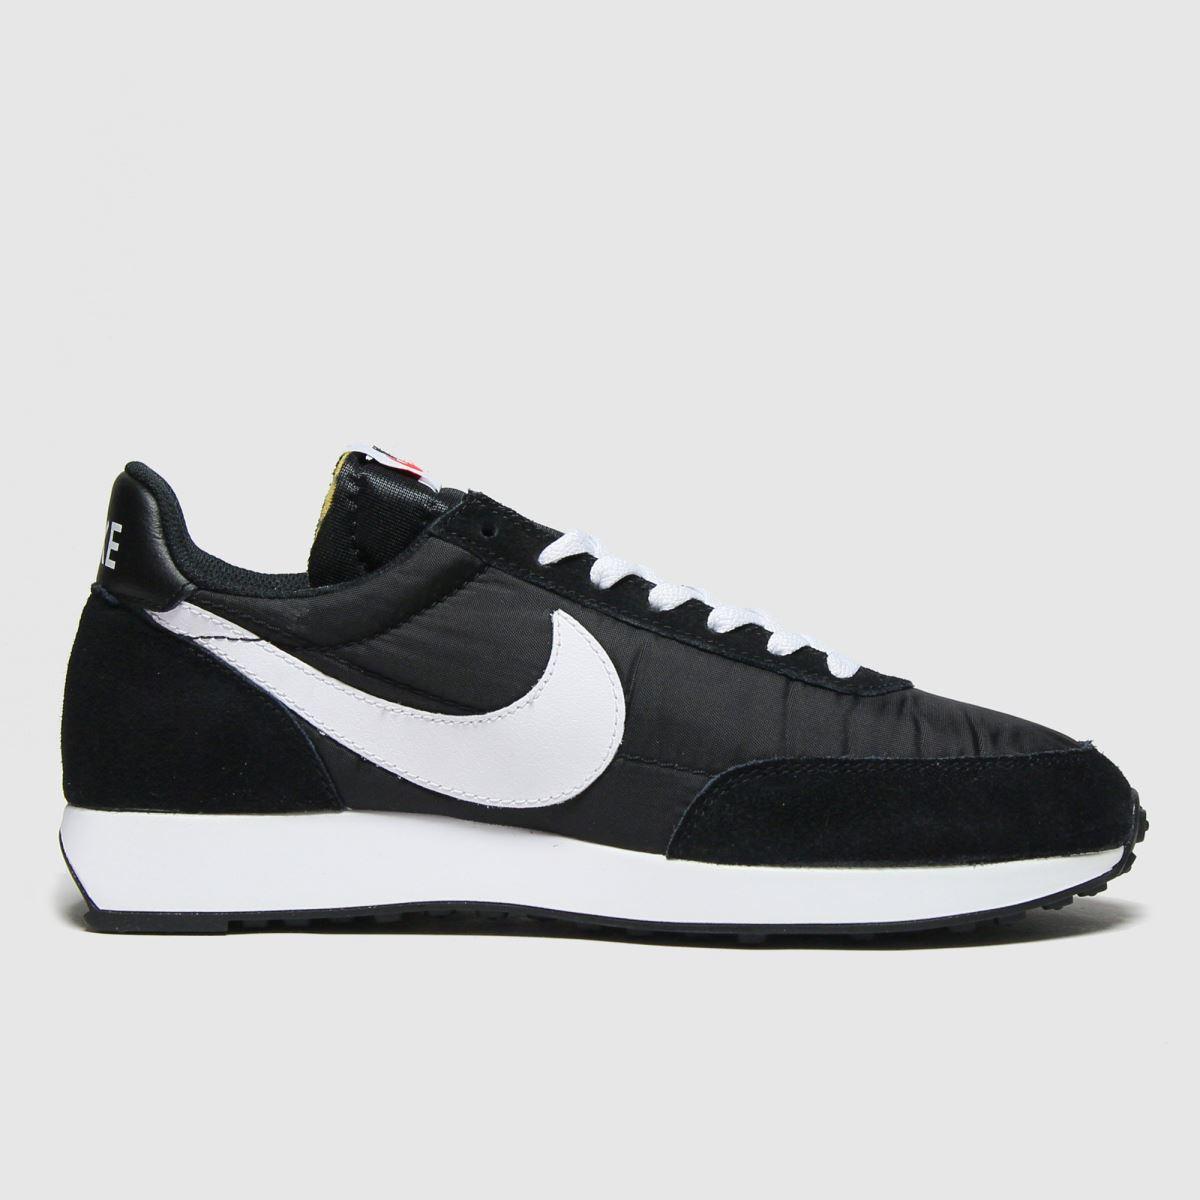 Nike Black & White Tailwind 79 Trainers